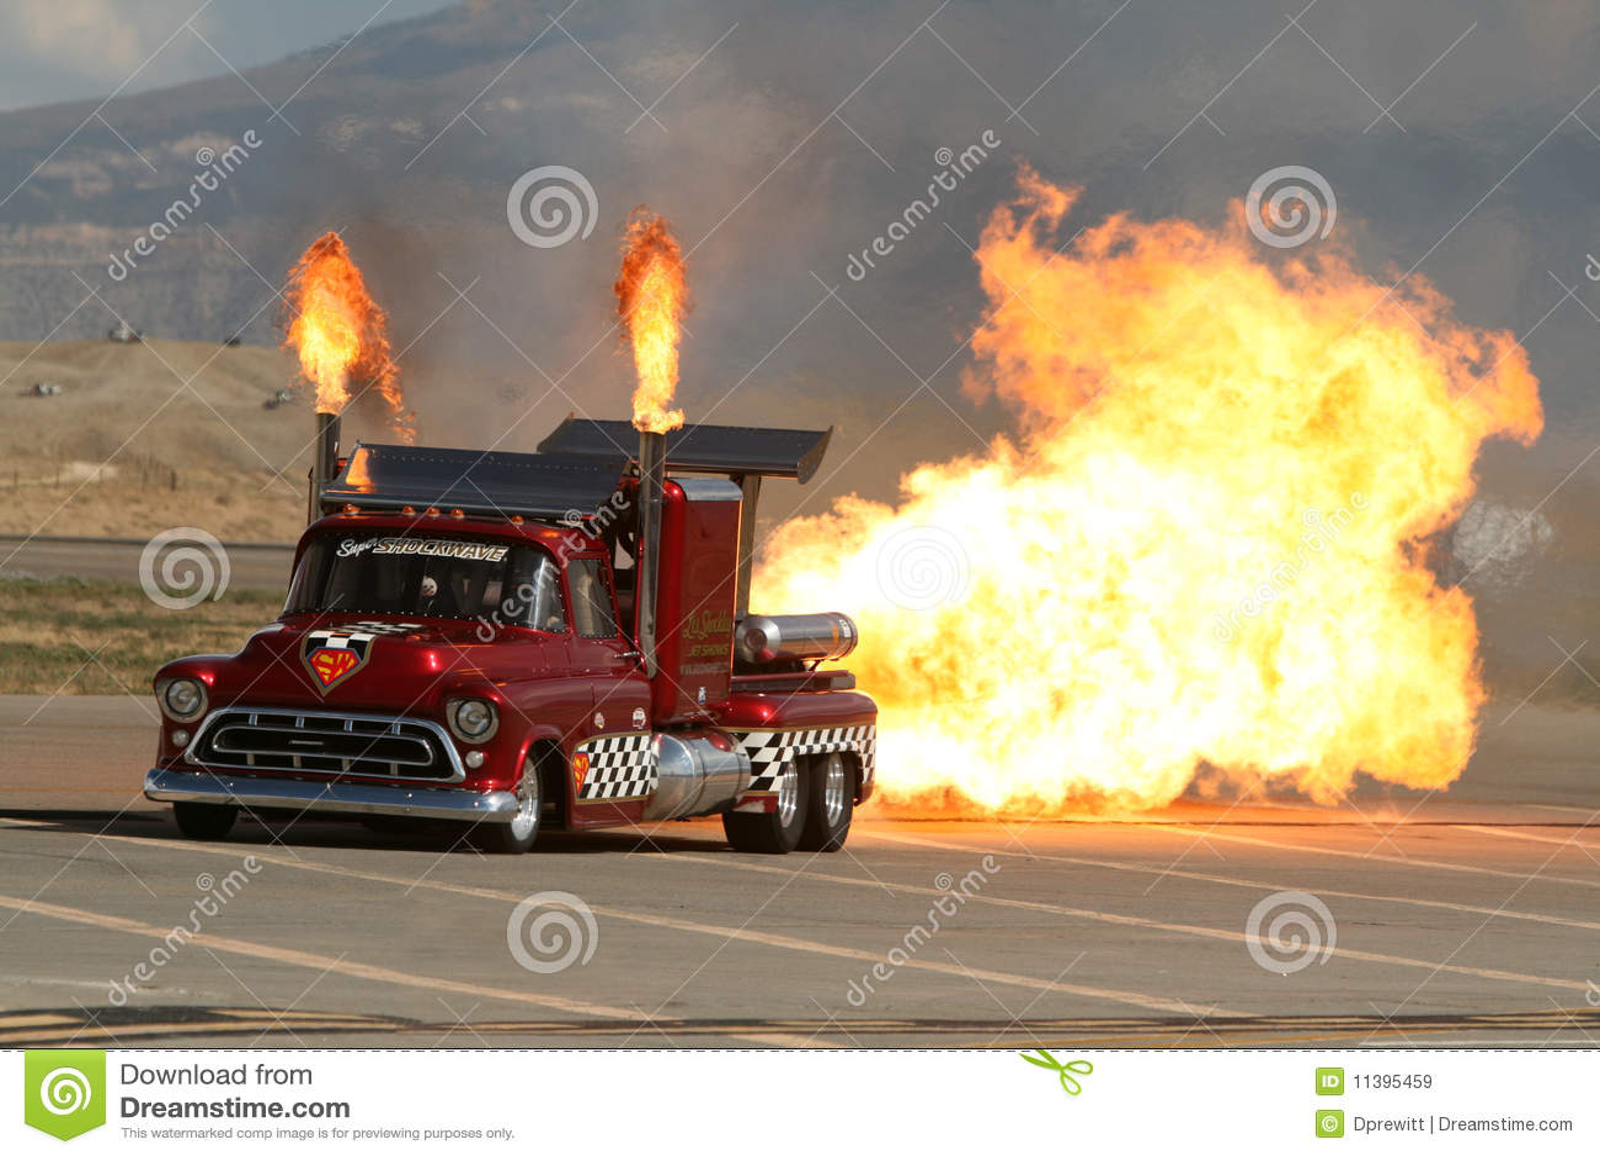 Super Shockwave Twin Jet Engine Truck